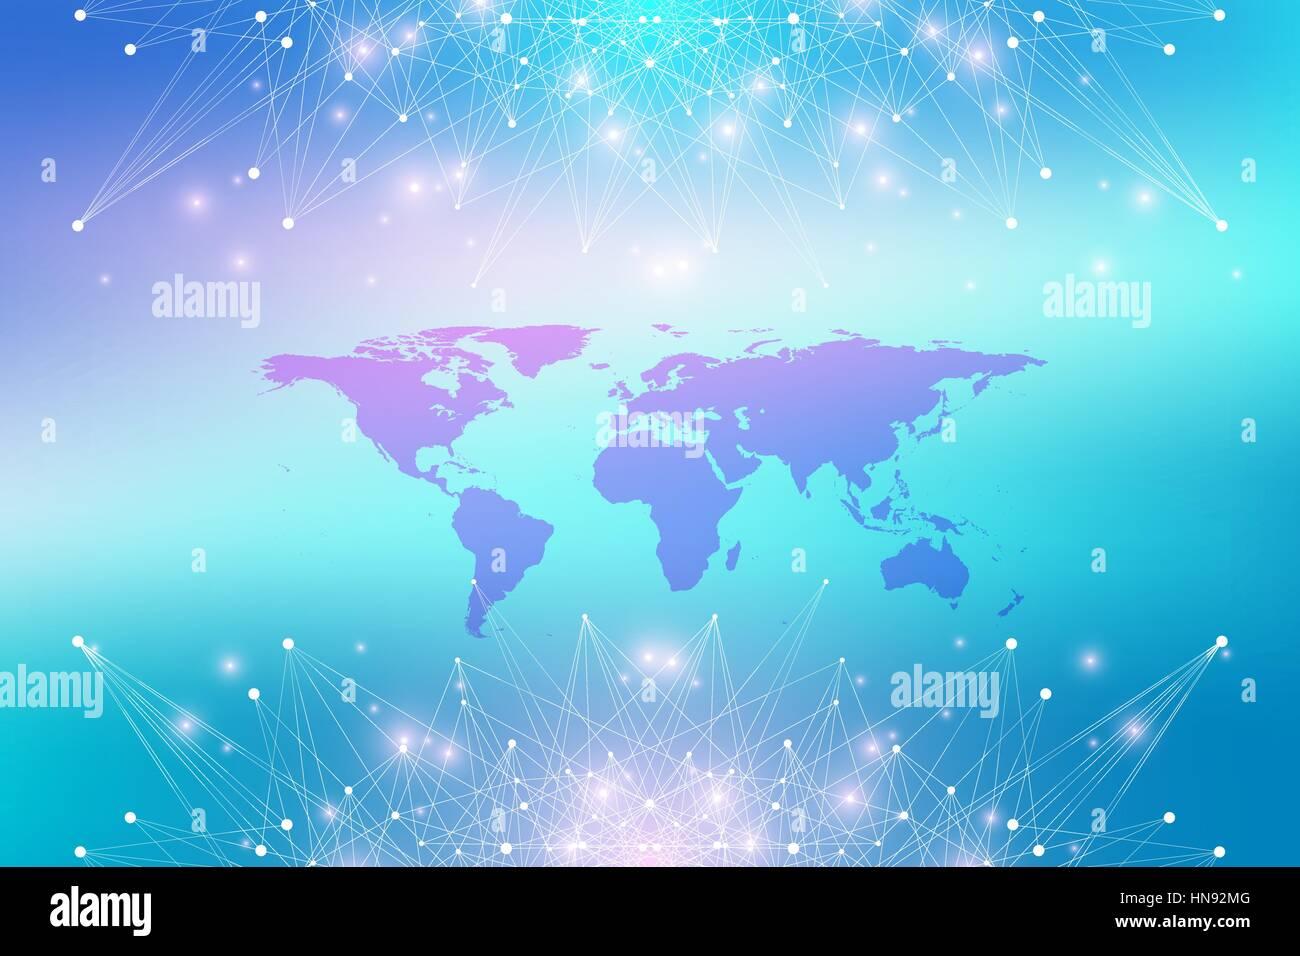 Geometric graphic background communication with world map big geometric graphic background communication with world map big data complex with compounds perspective backdrop minimal array digital data visualization gumiabroncs Gallery